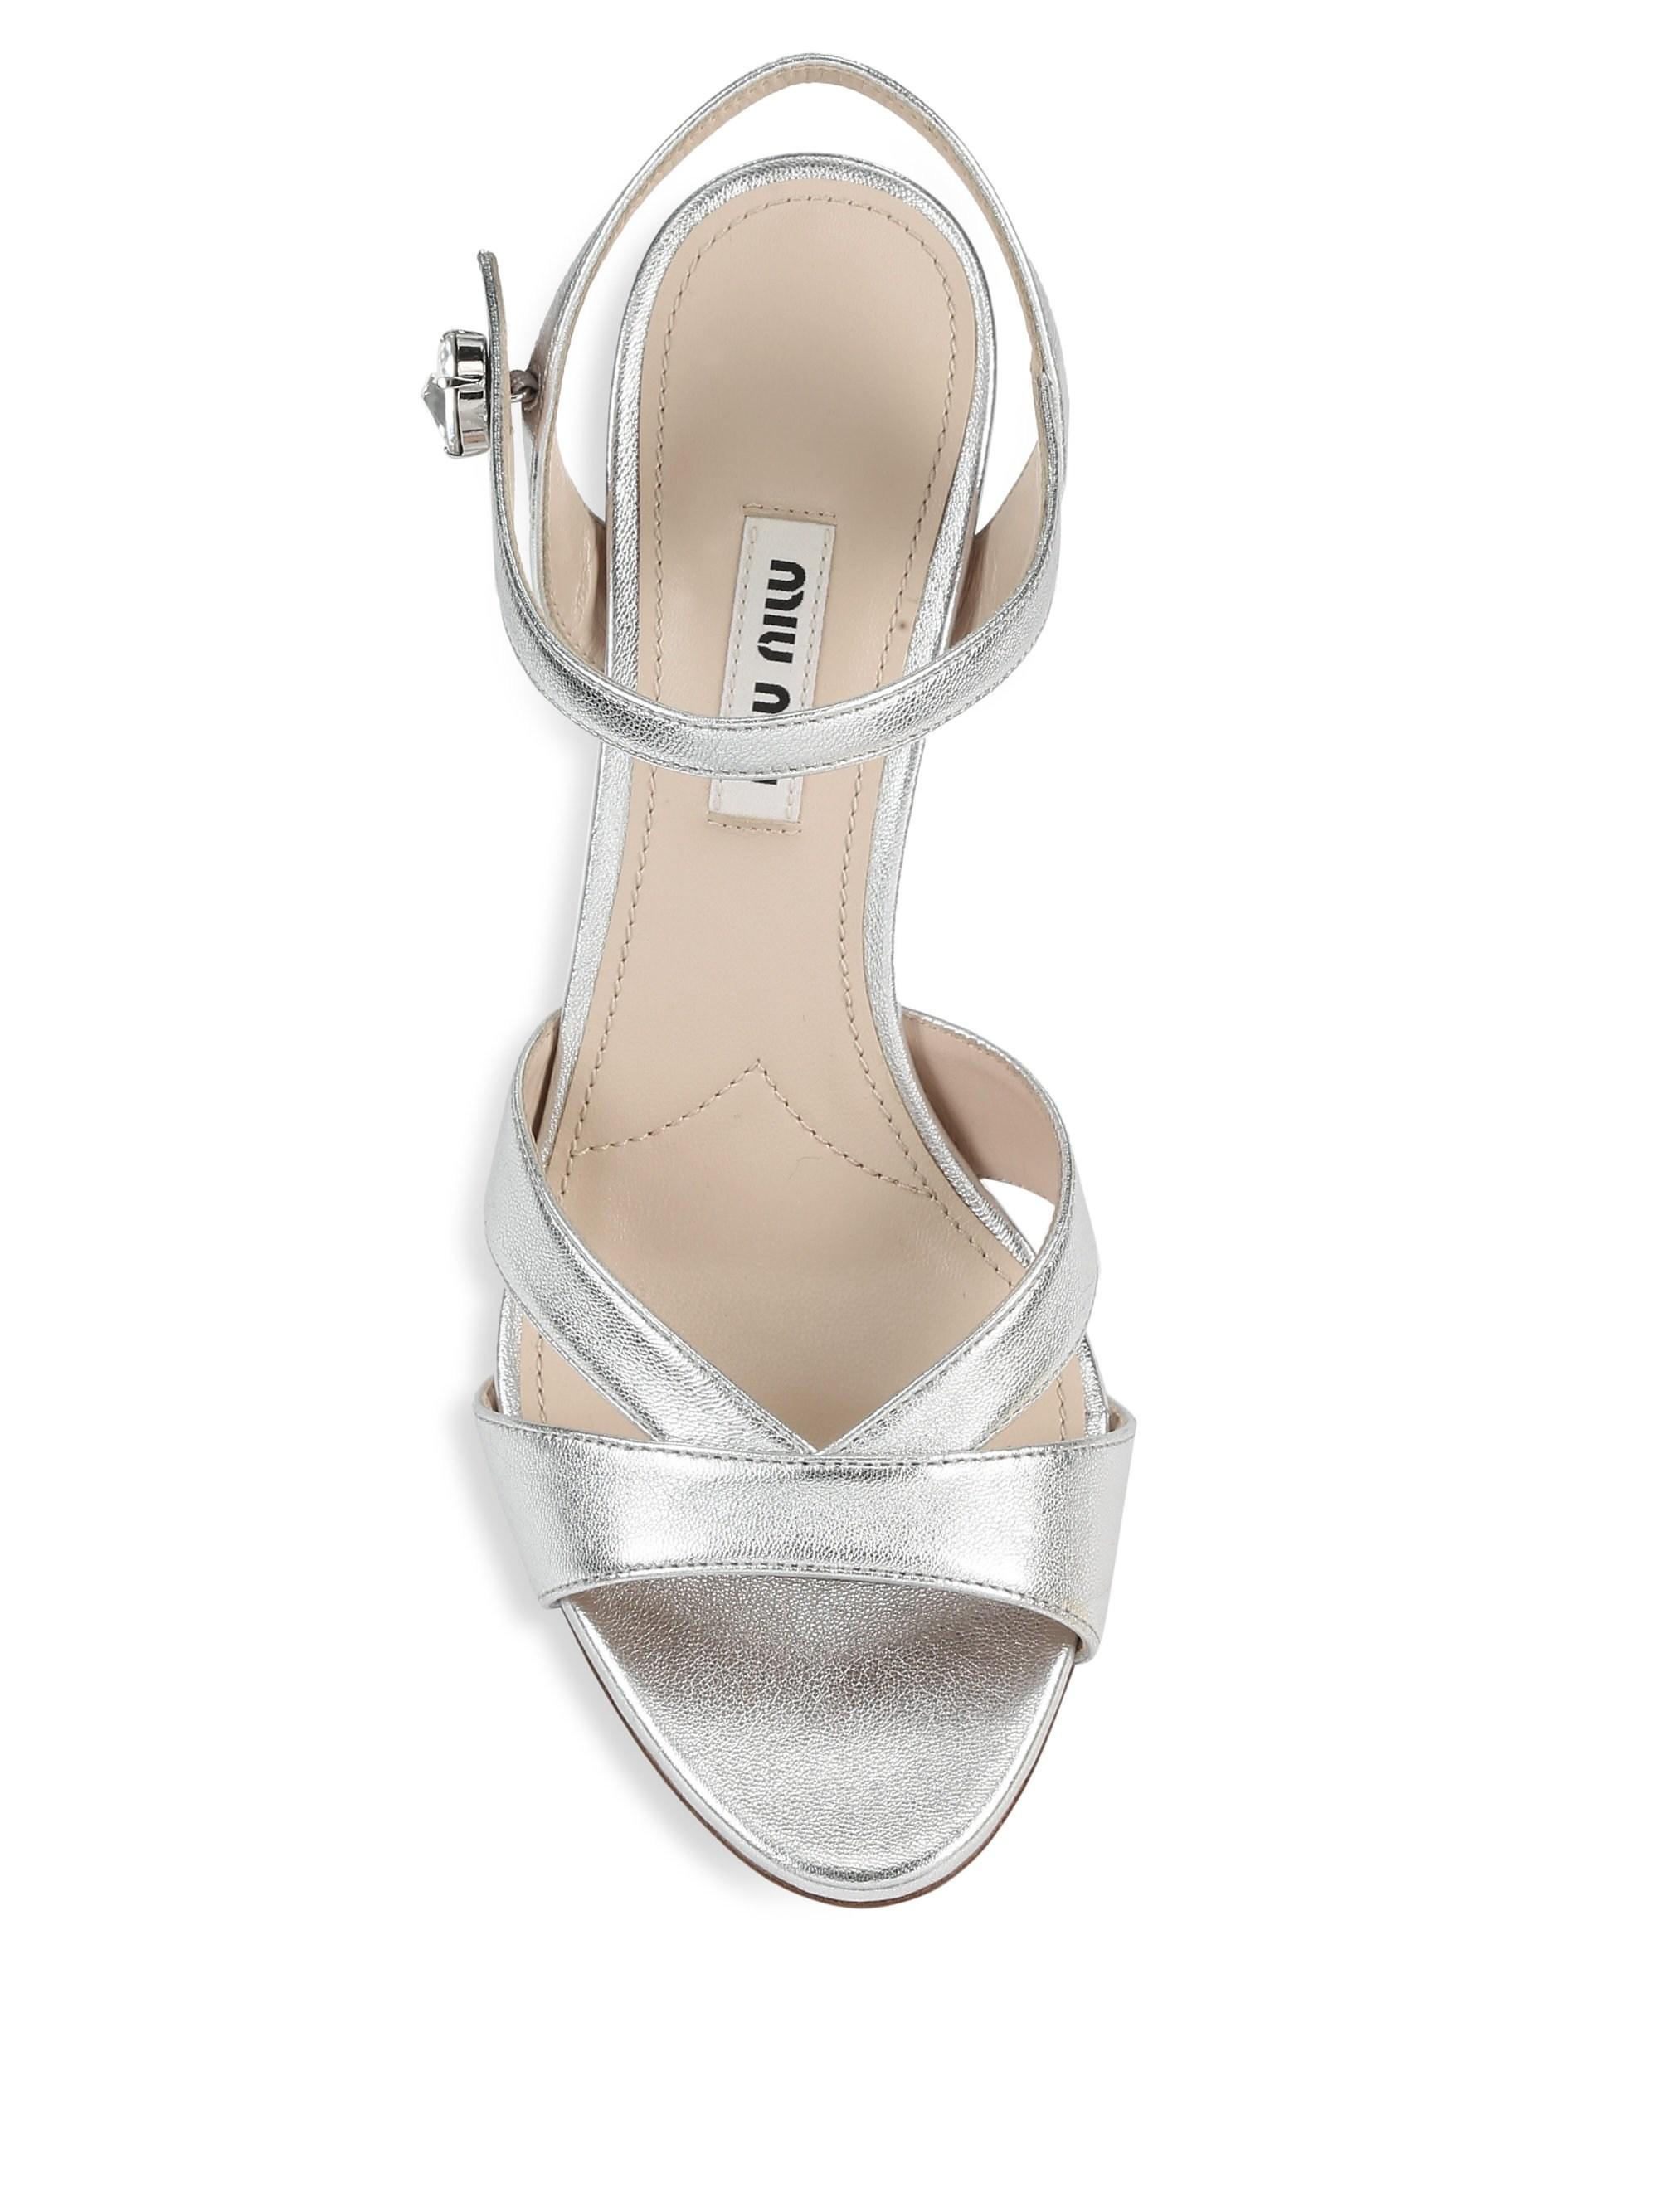 df9ef63cf3f719 Lyst - Miu Miu Women s Metallic Leather Block Heel Sandals - Silver - Size  41.5 (11.5) in Metallic